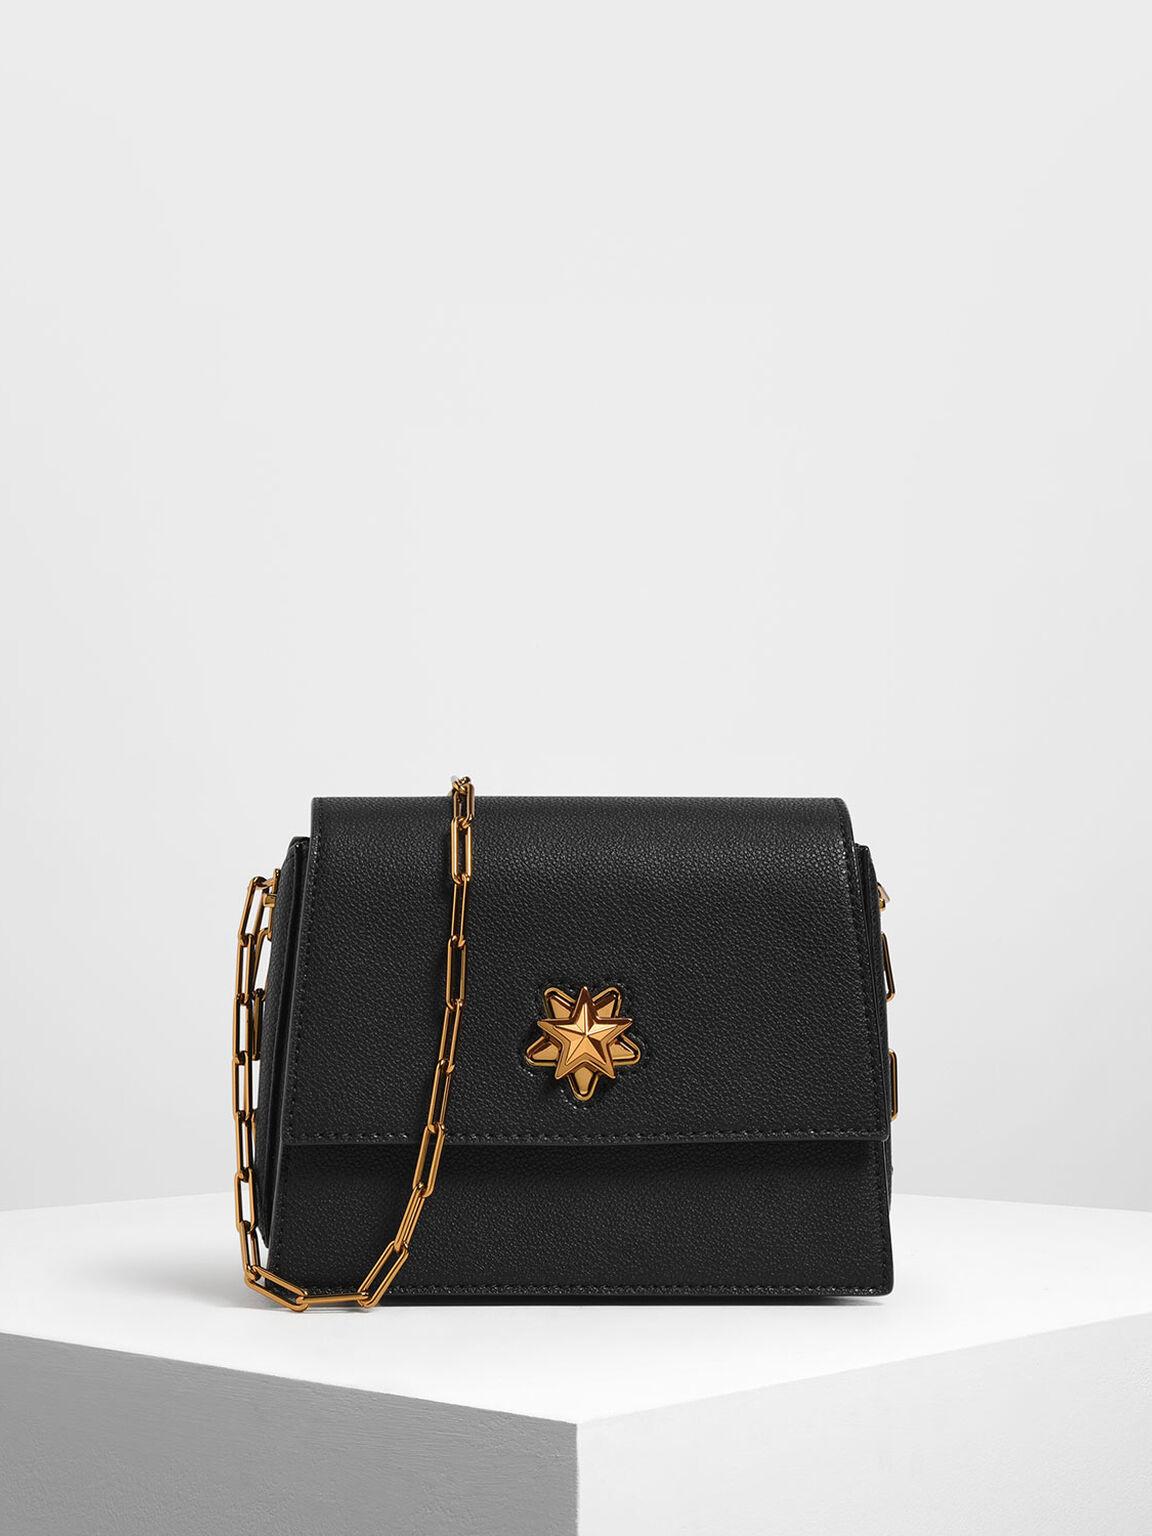 Star Buckle Crossbody Bag, Black, hi-res